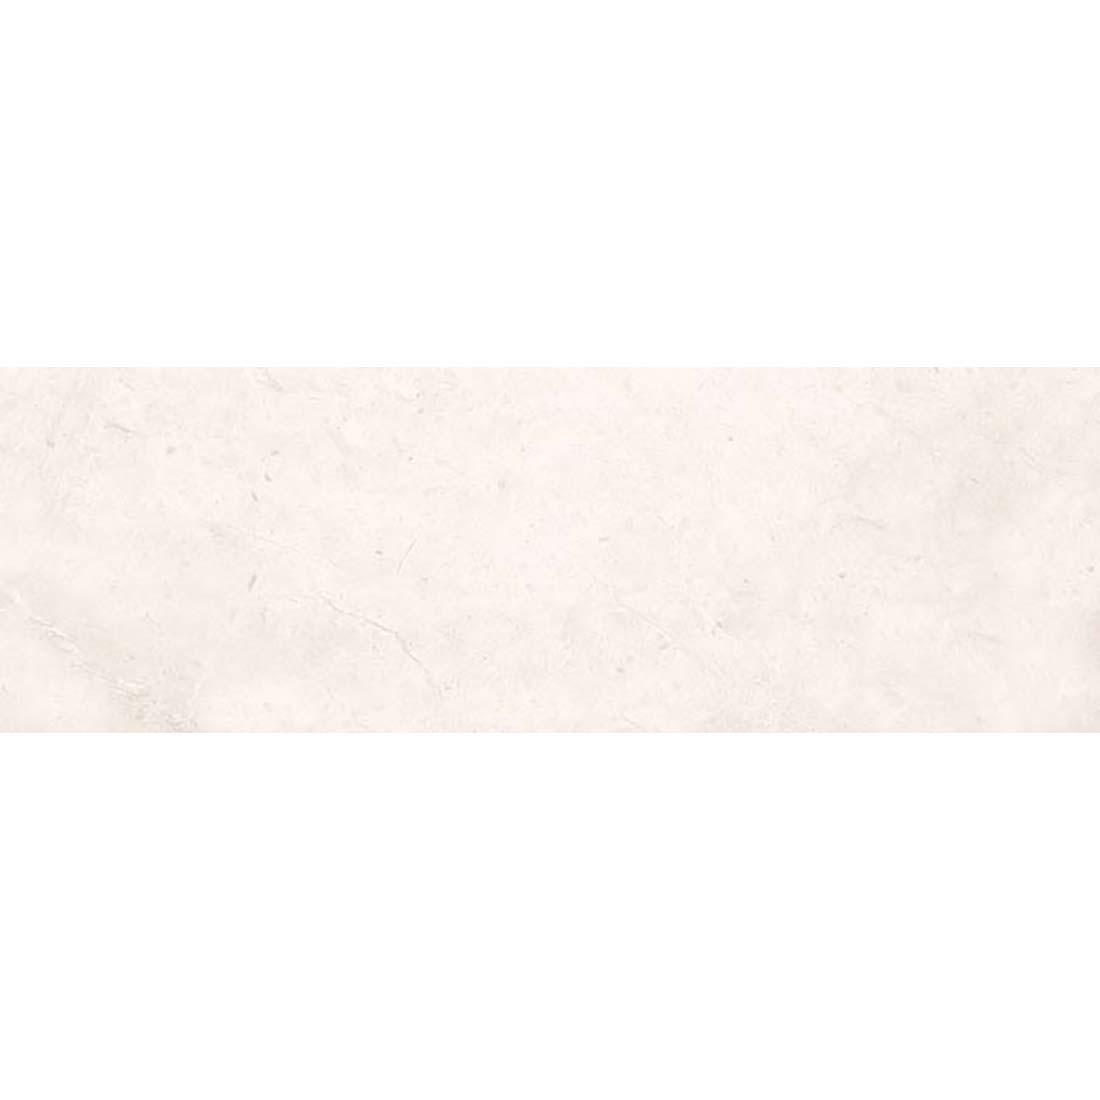 Mist 20x60 Ivory 1